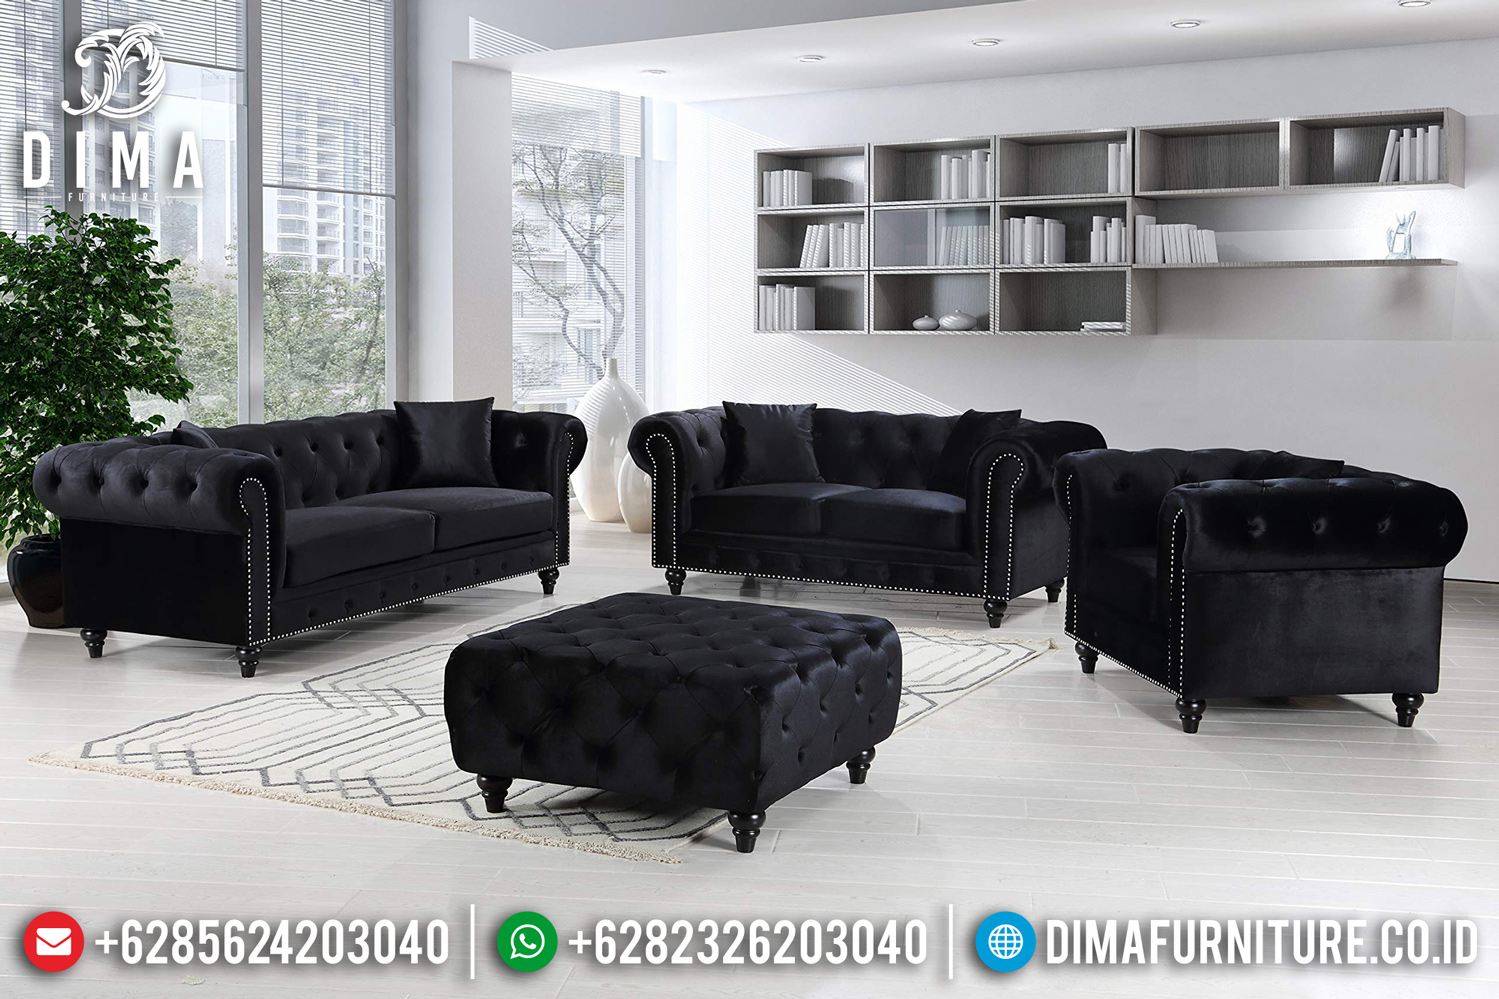 Sofa Tamu Minimalis Modern Chesterfield Furniture Jepara TTJ-0481